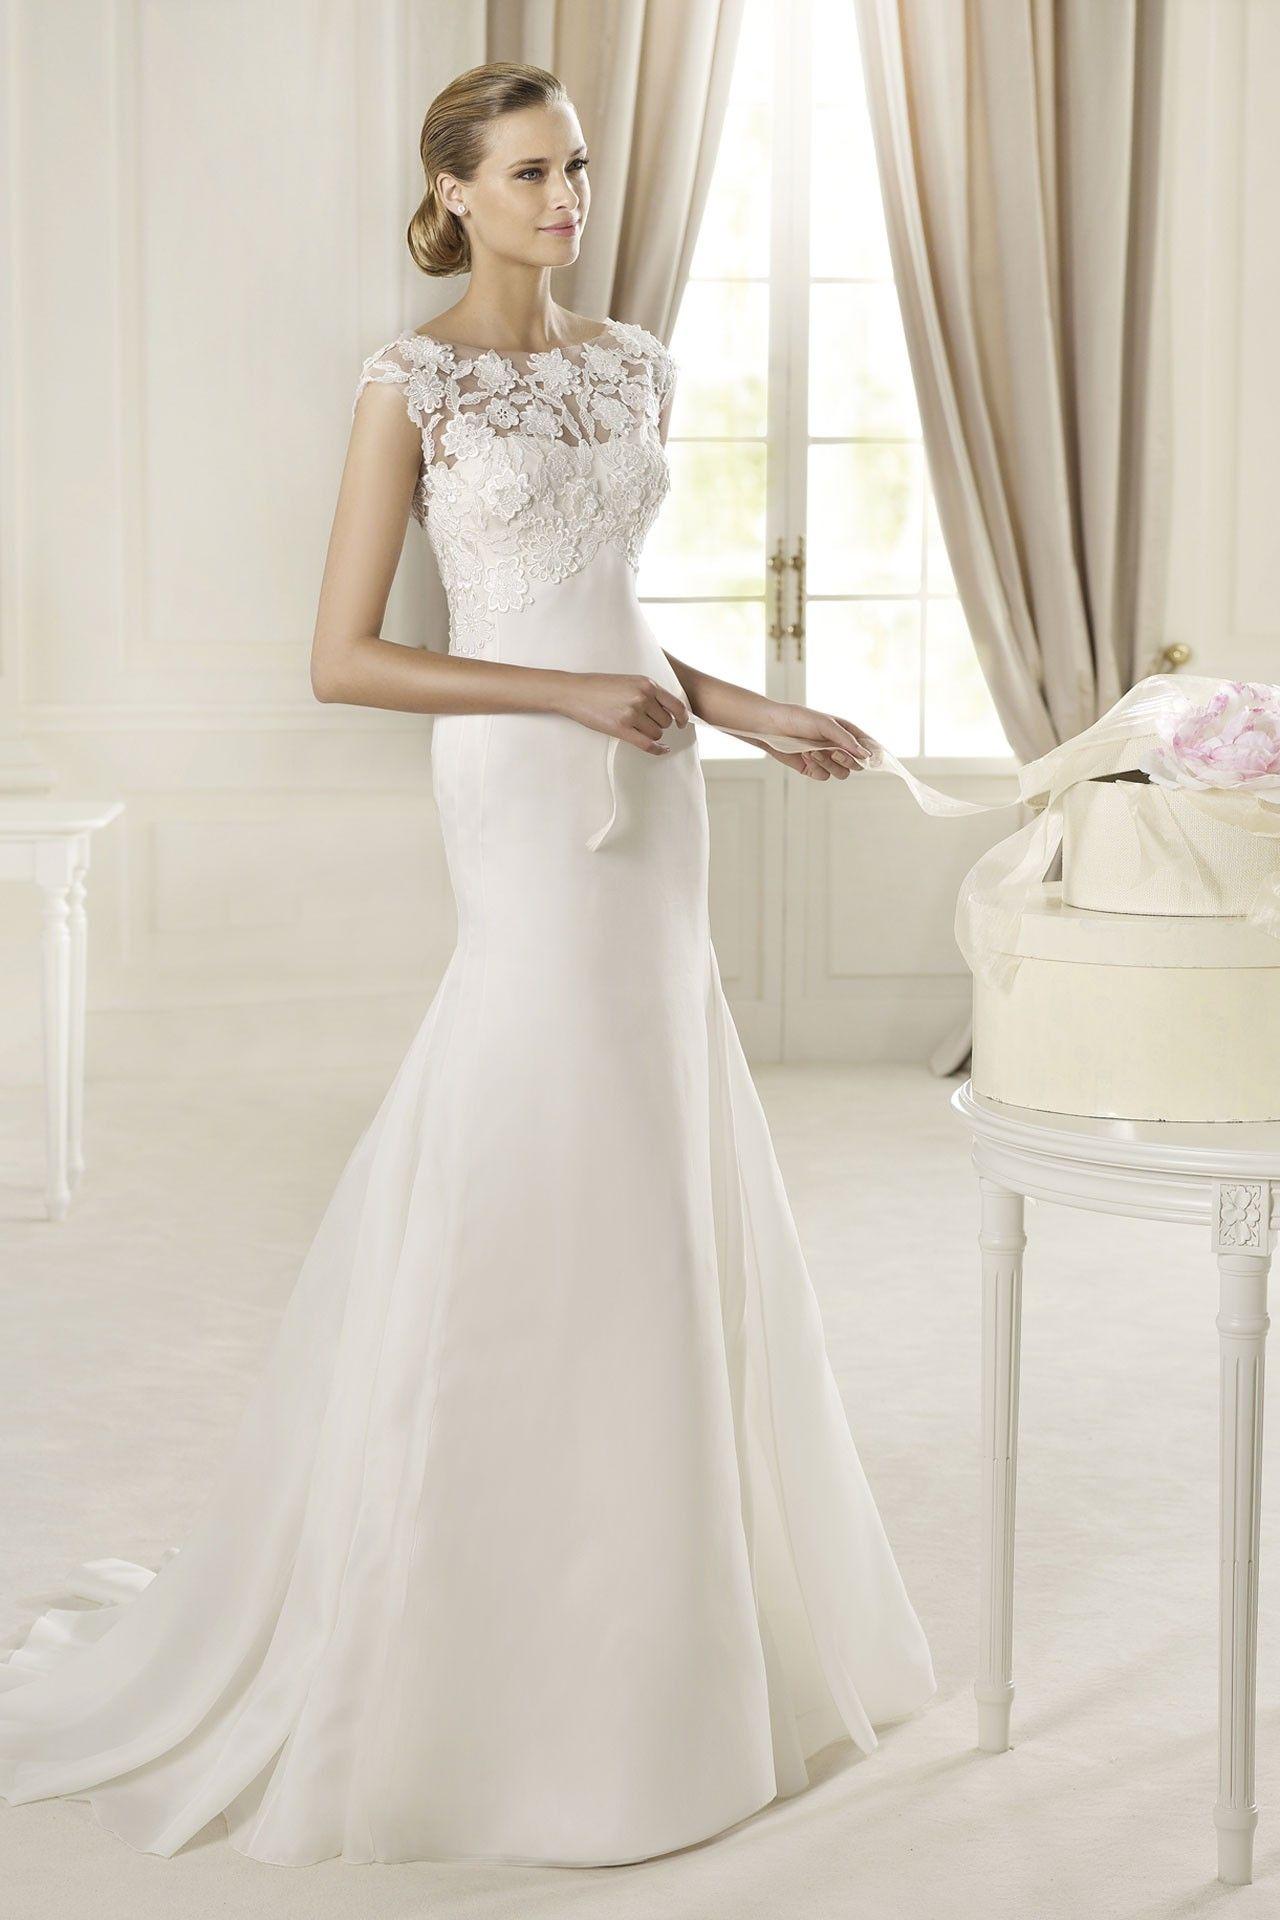 Vera wang designer wedding dresses  Wedding Dresses  The Ultimate Gallery BridesMagazine